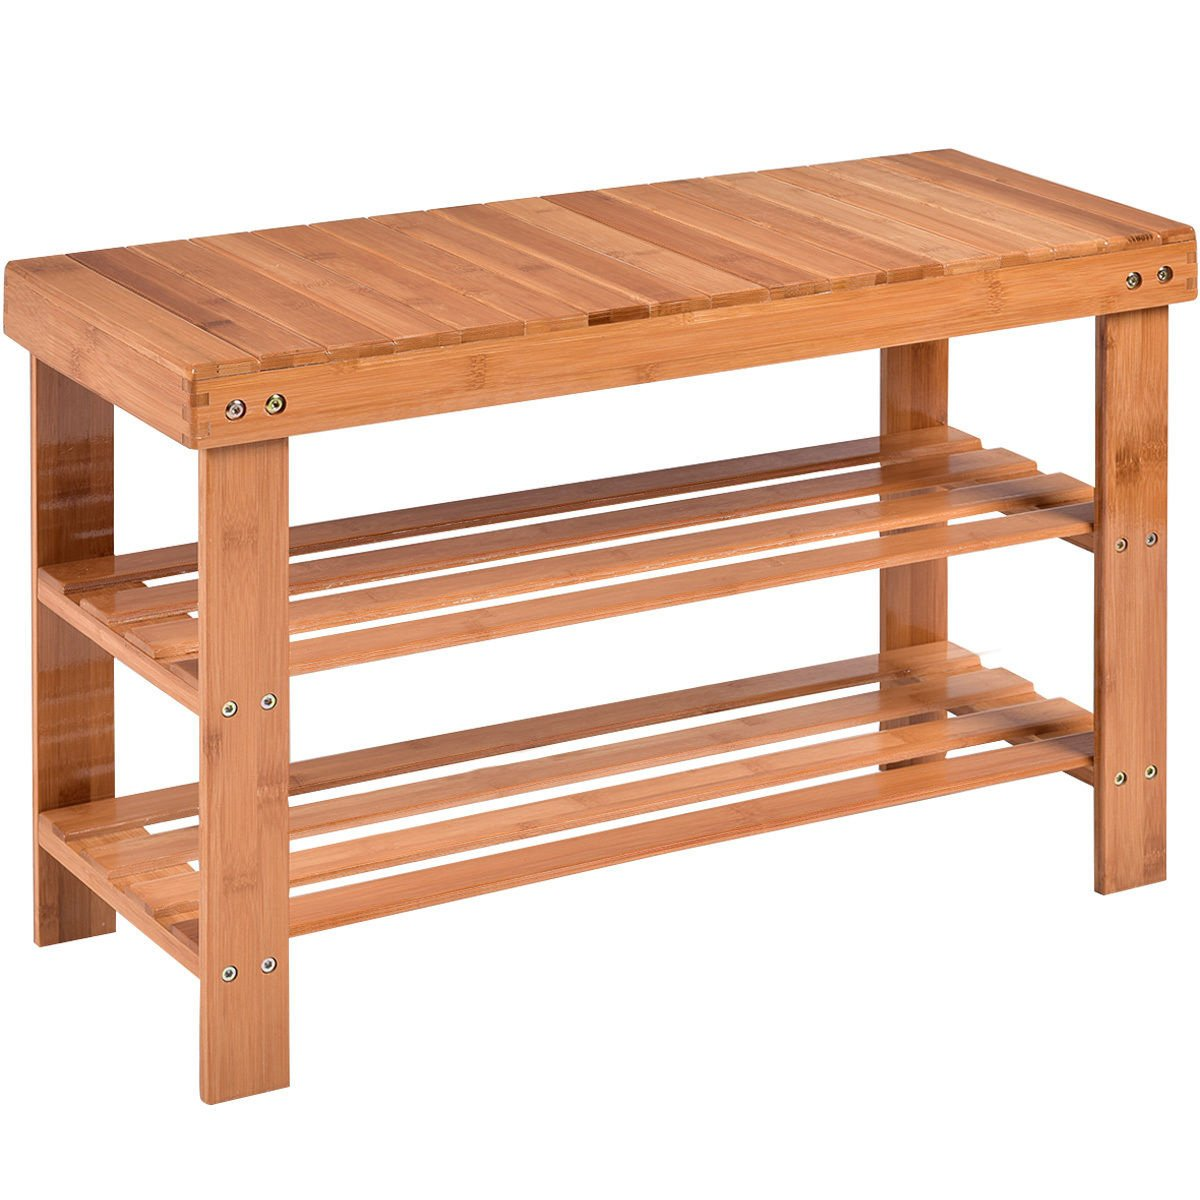 COSTWAY Bamboo Shoe Rack Bench 3-tier Free Standing Wood Shoe Storage Organizer Shelf Holder Home Entryway Hallway Furniture Eco-Friendly (Natural)